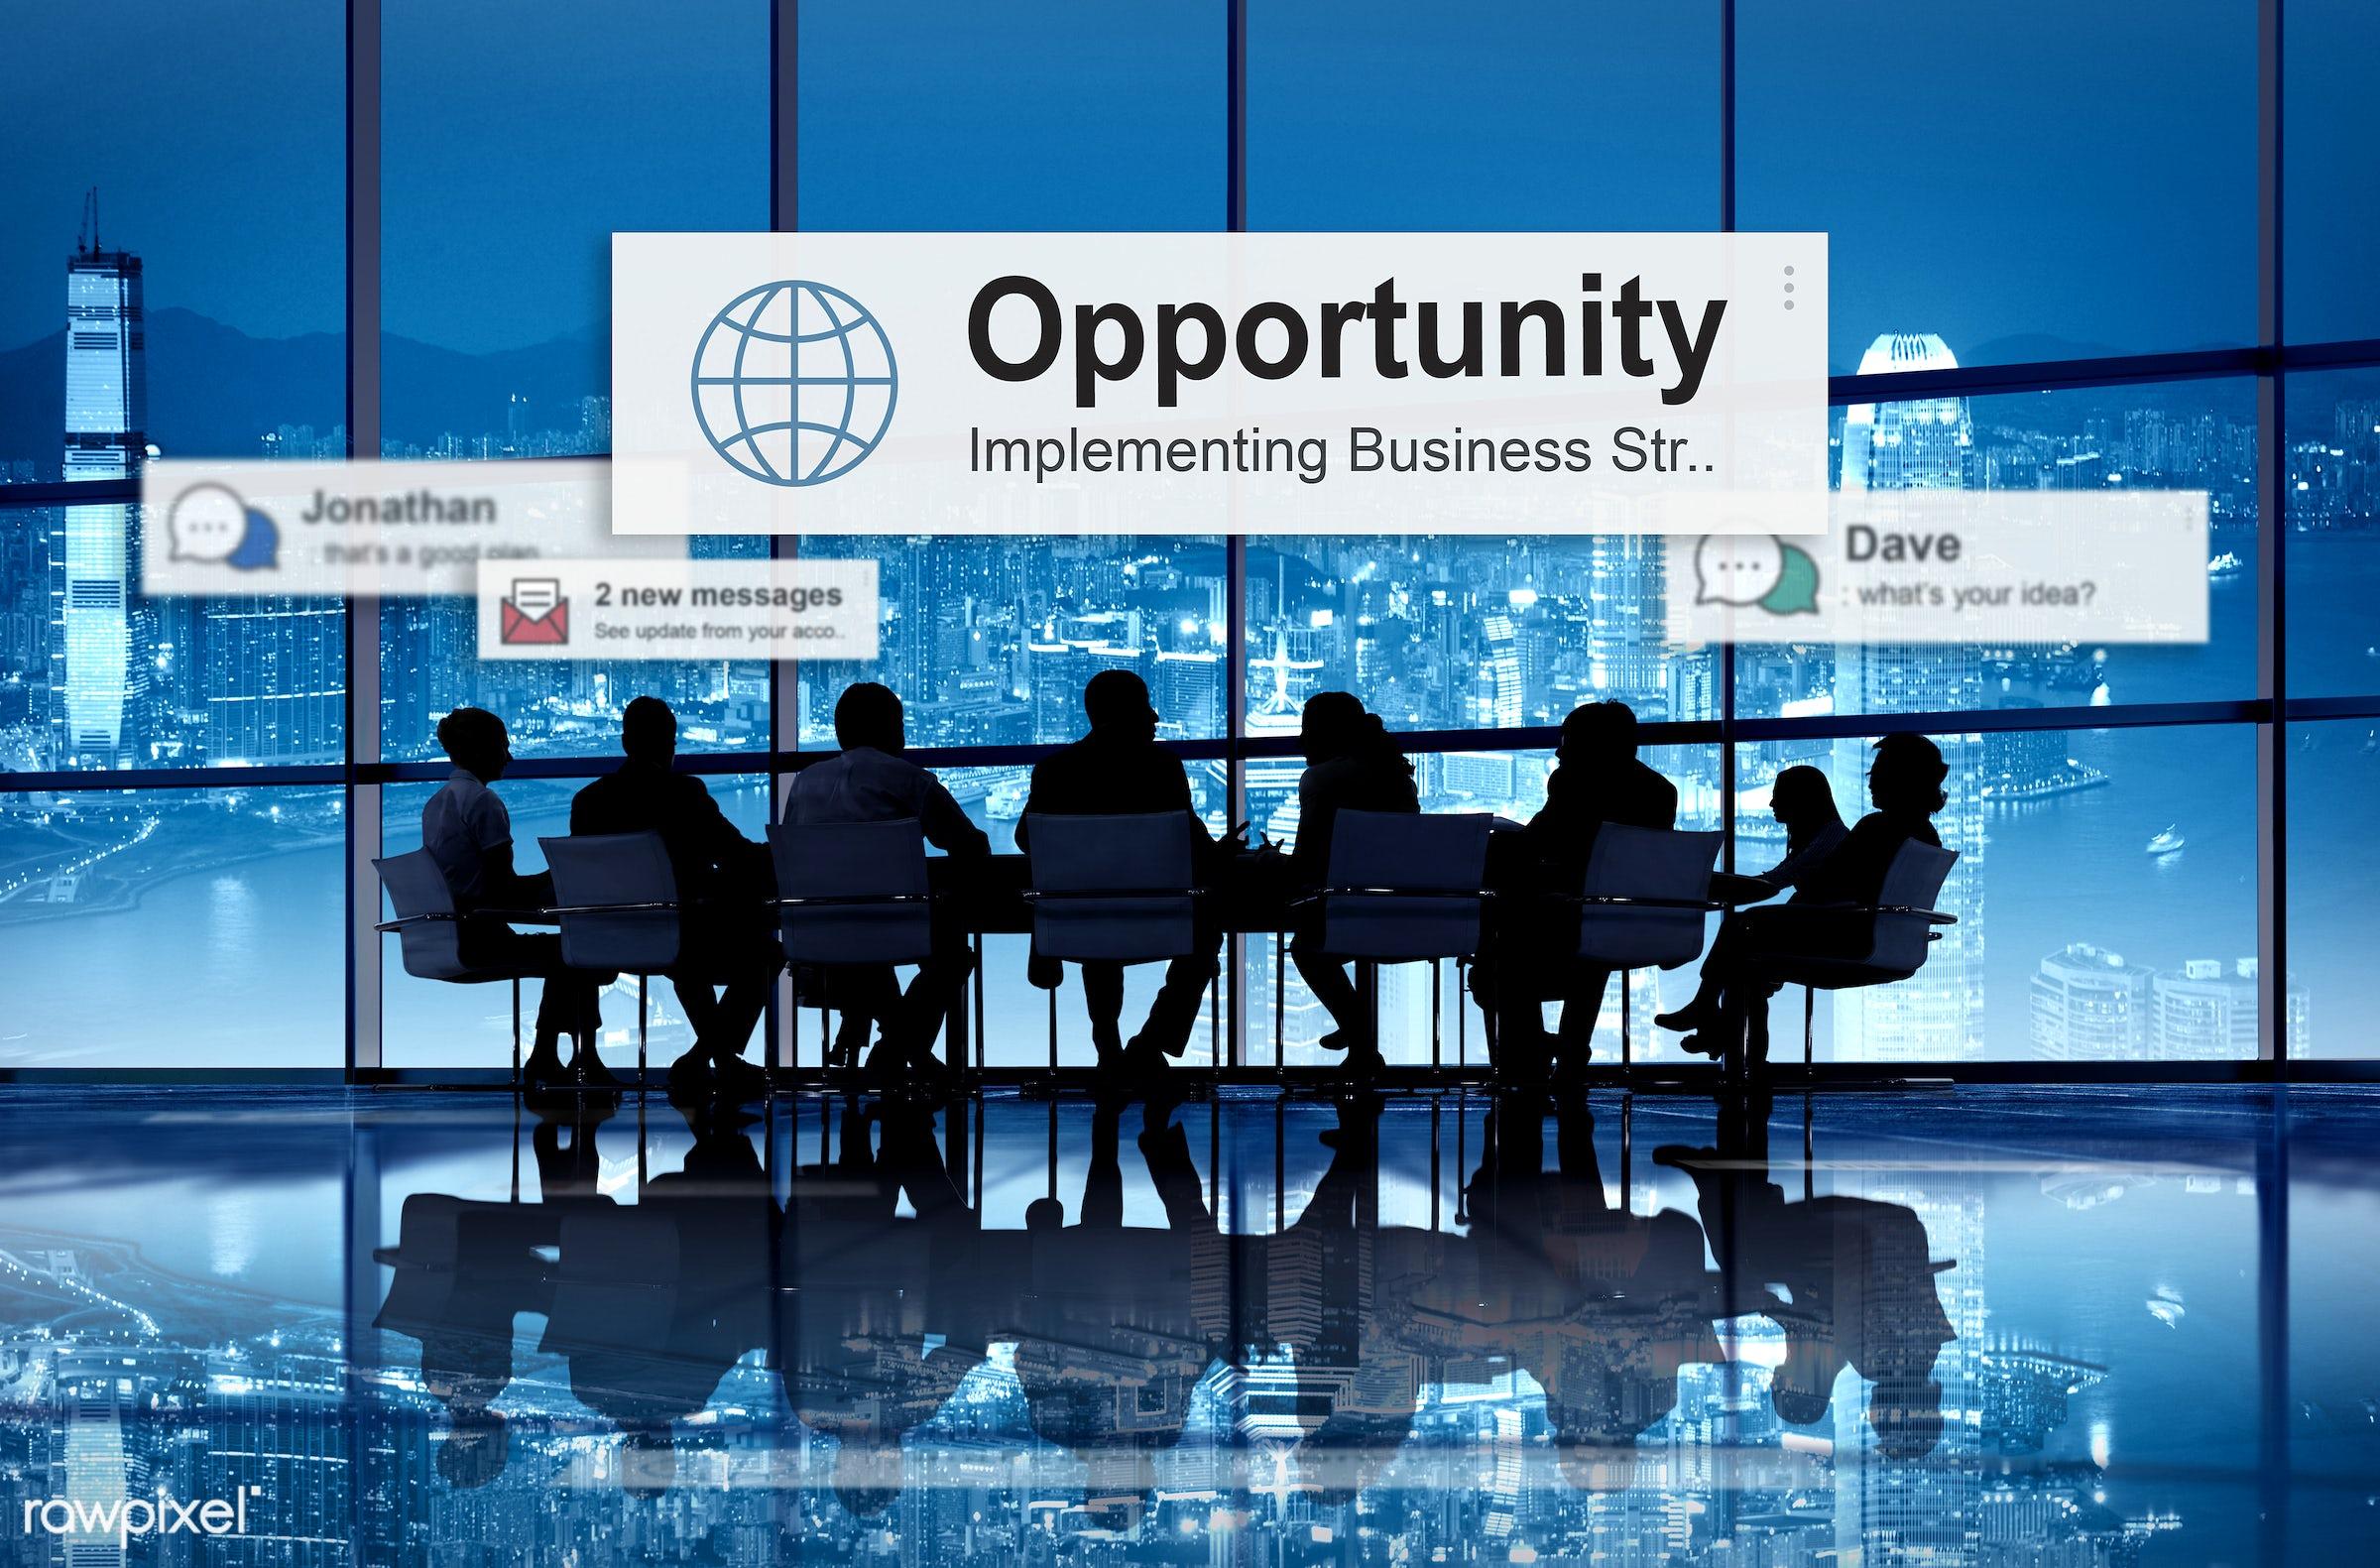 business, achievement, application, browser, building, business people, businessmen, businesswomen, career, chance, choice,...